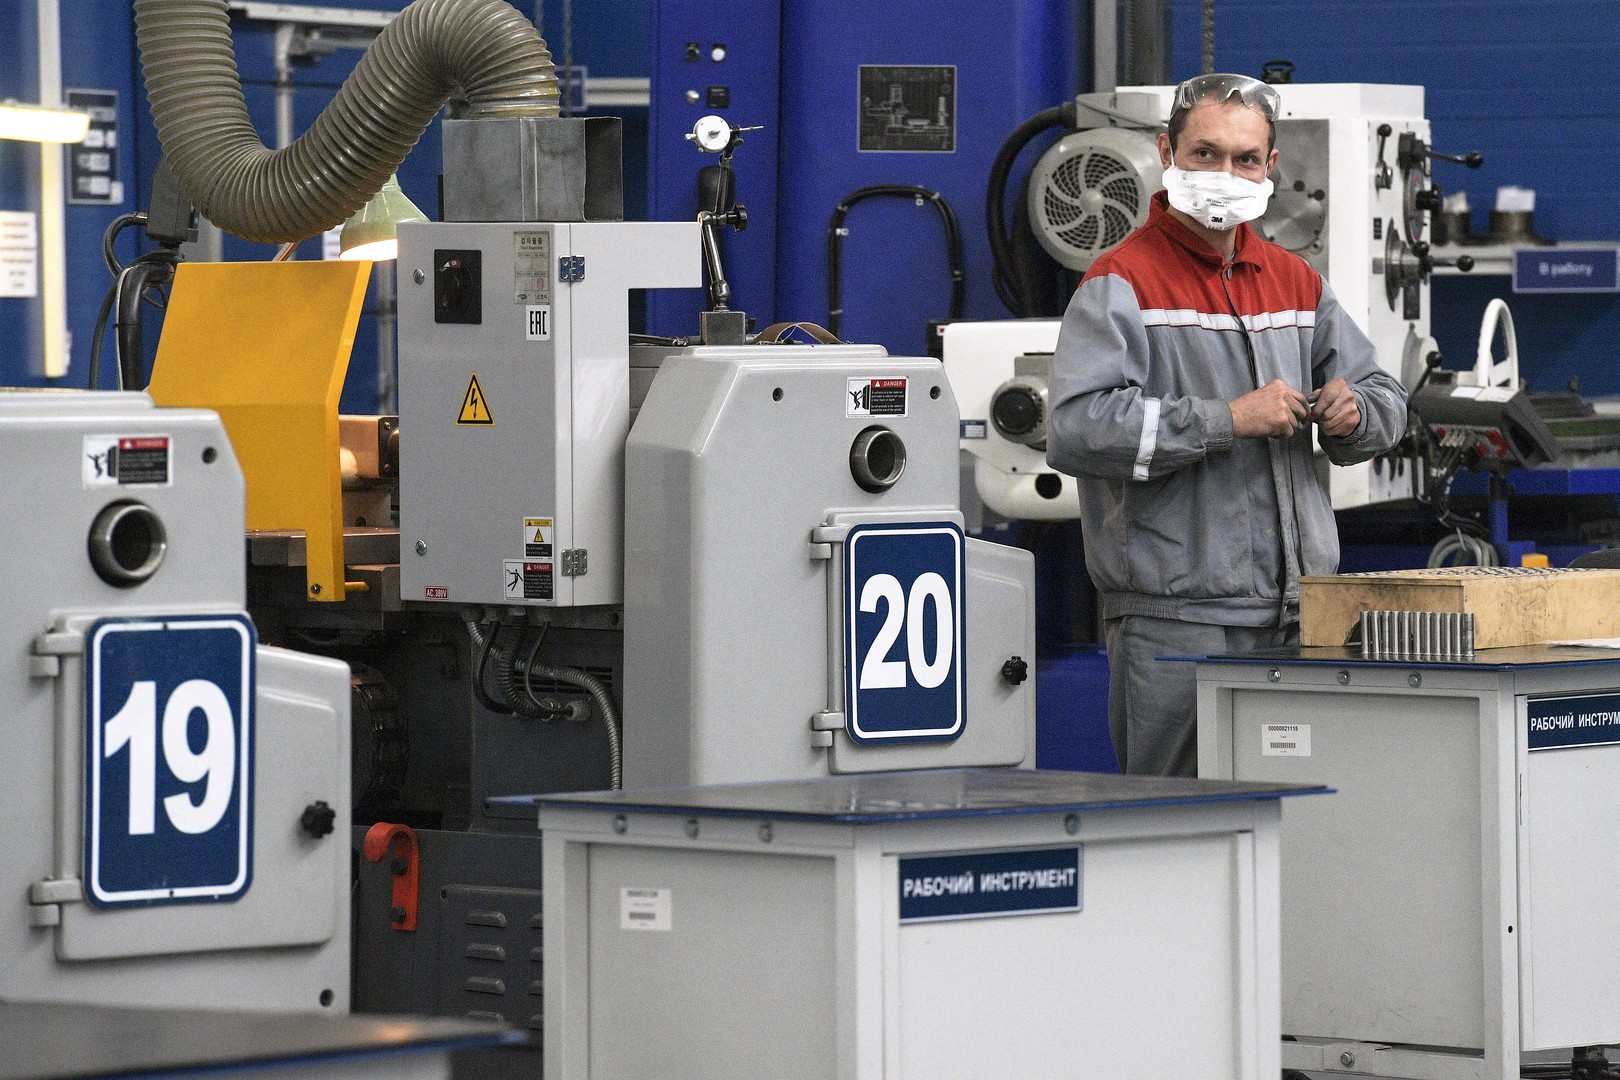 Corona-Krise in Russland: Produktionsstopp trifft deutsche Firmen hart